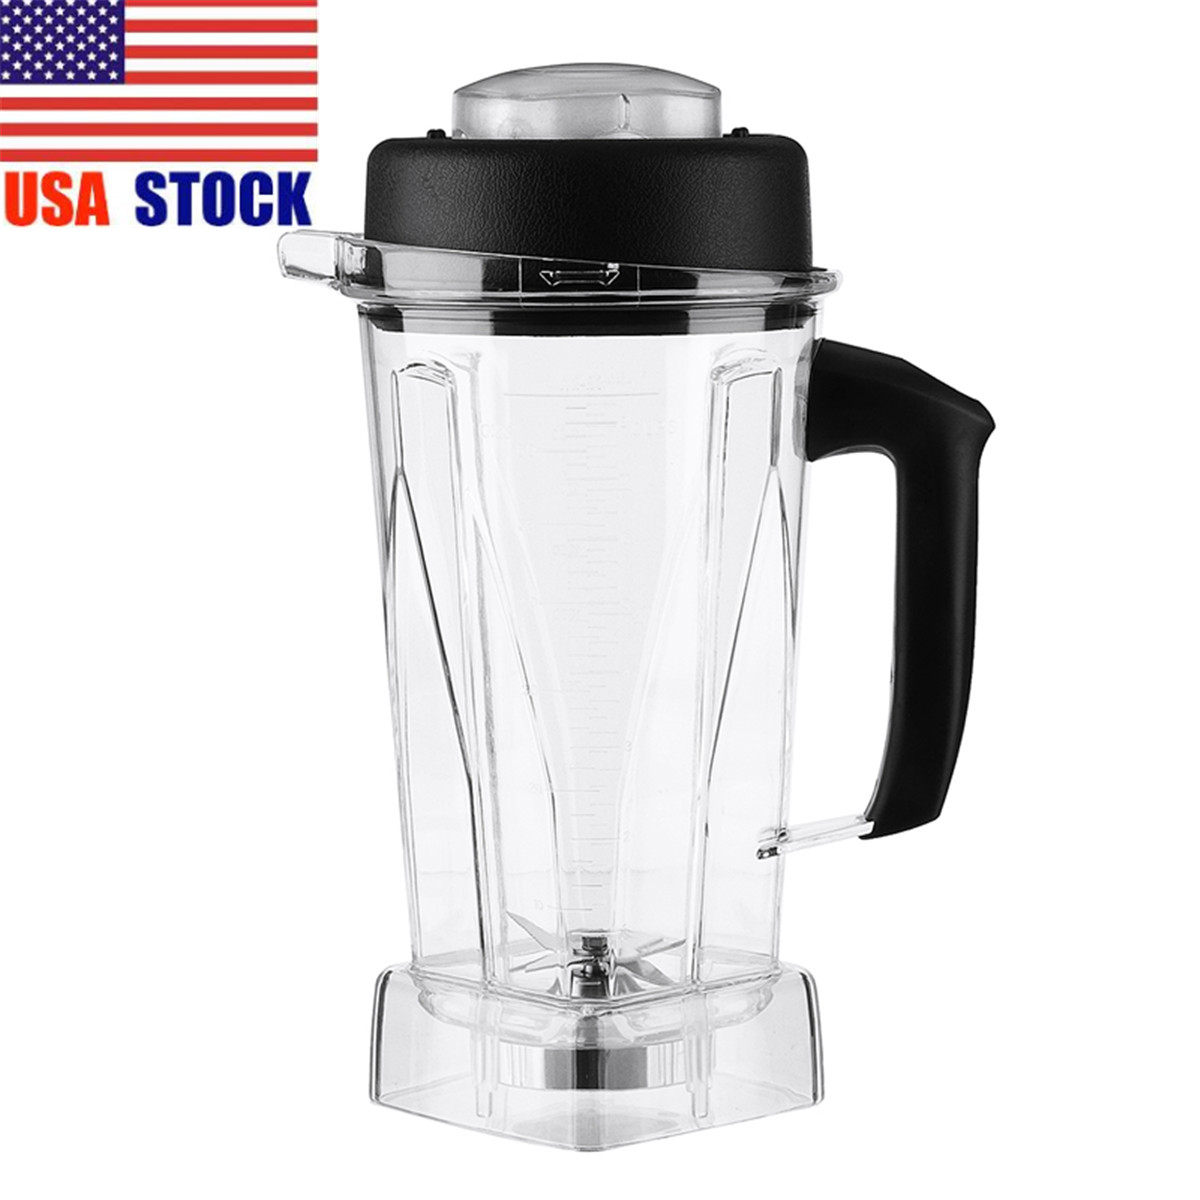 2L Container Jar Jug Pitcher Cup Commercial Blender/ Spare Parts for Vitamix 60oz Home Kitchen Appliance Food Mixer Part Durable